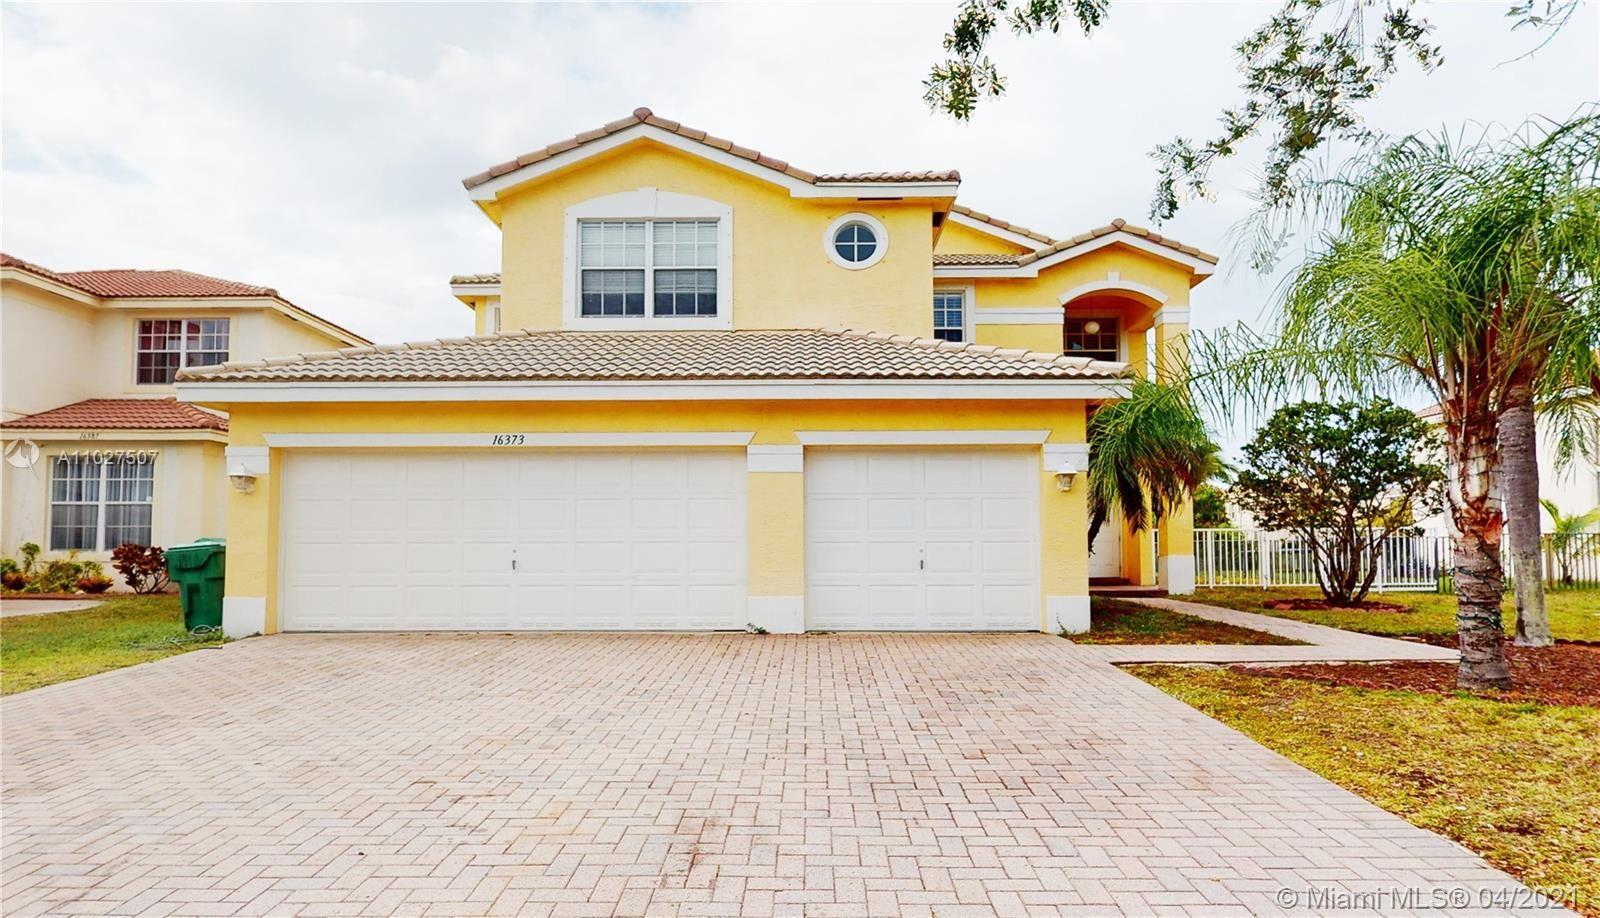 16373 SW 30th St, Miramar, FL 33027 - #: A11027507